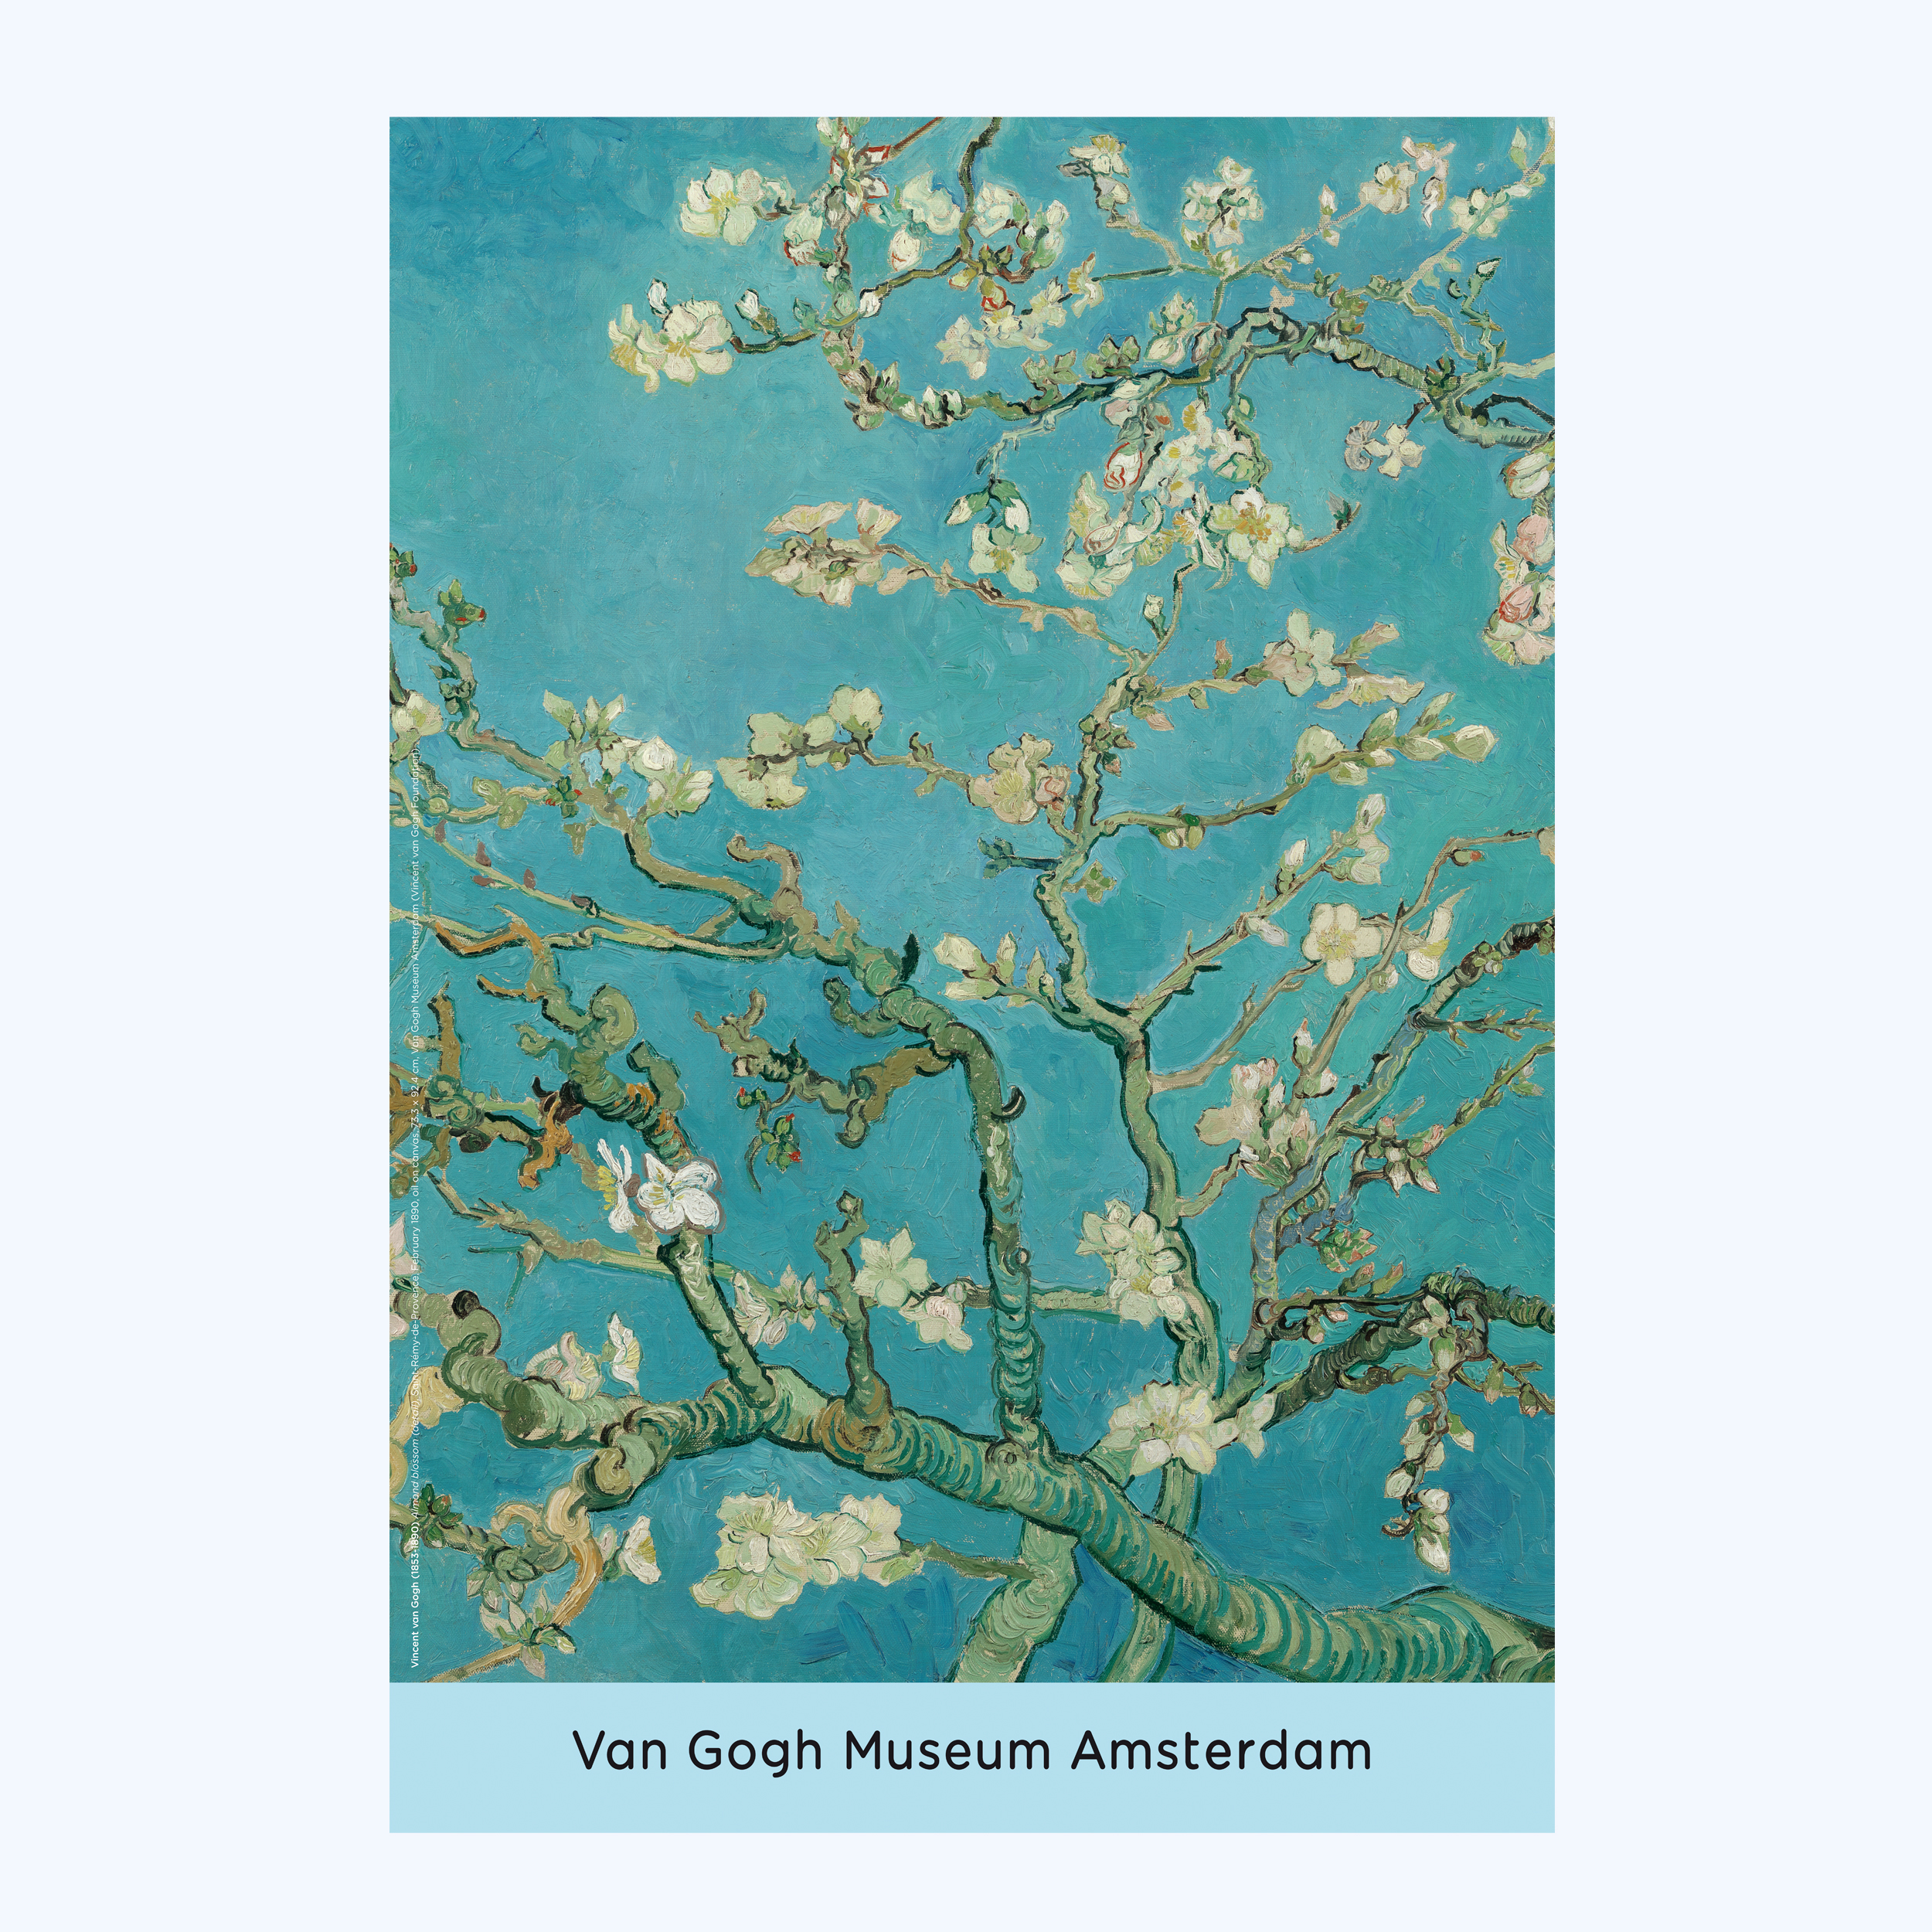 Van Gogh Poster Almond Blossom - Van Gogh Museum shop for Almond Blossom Van Gogh Poster  104xkb